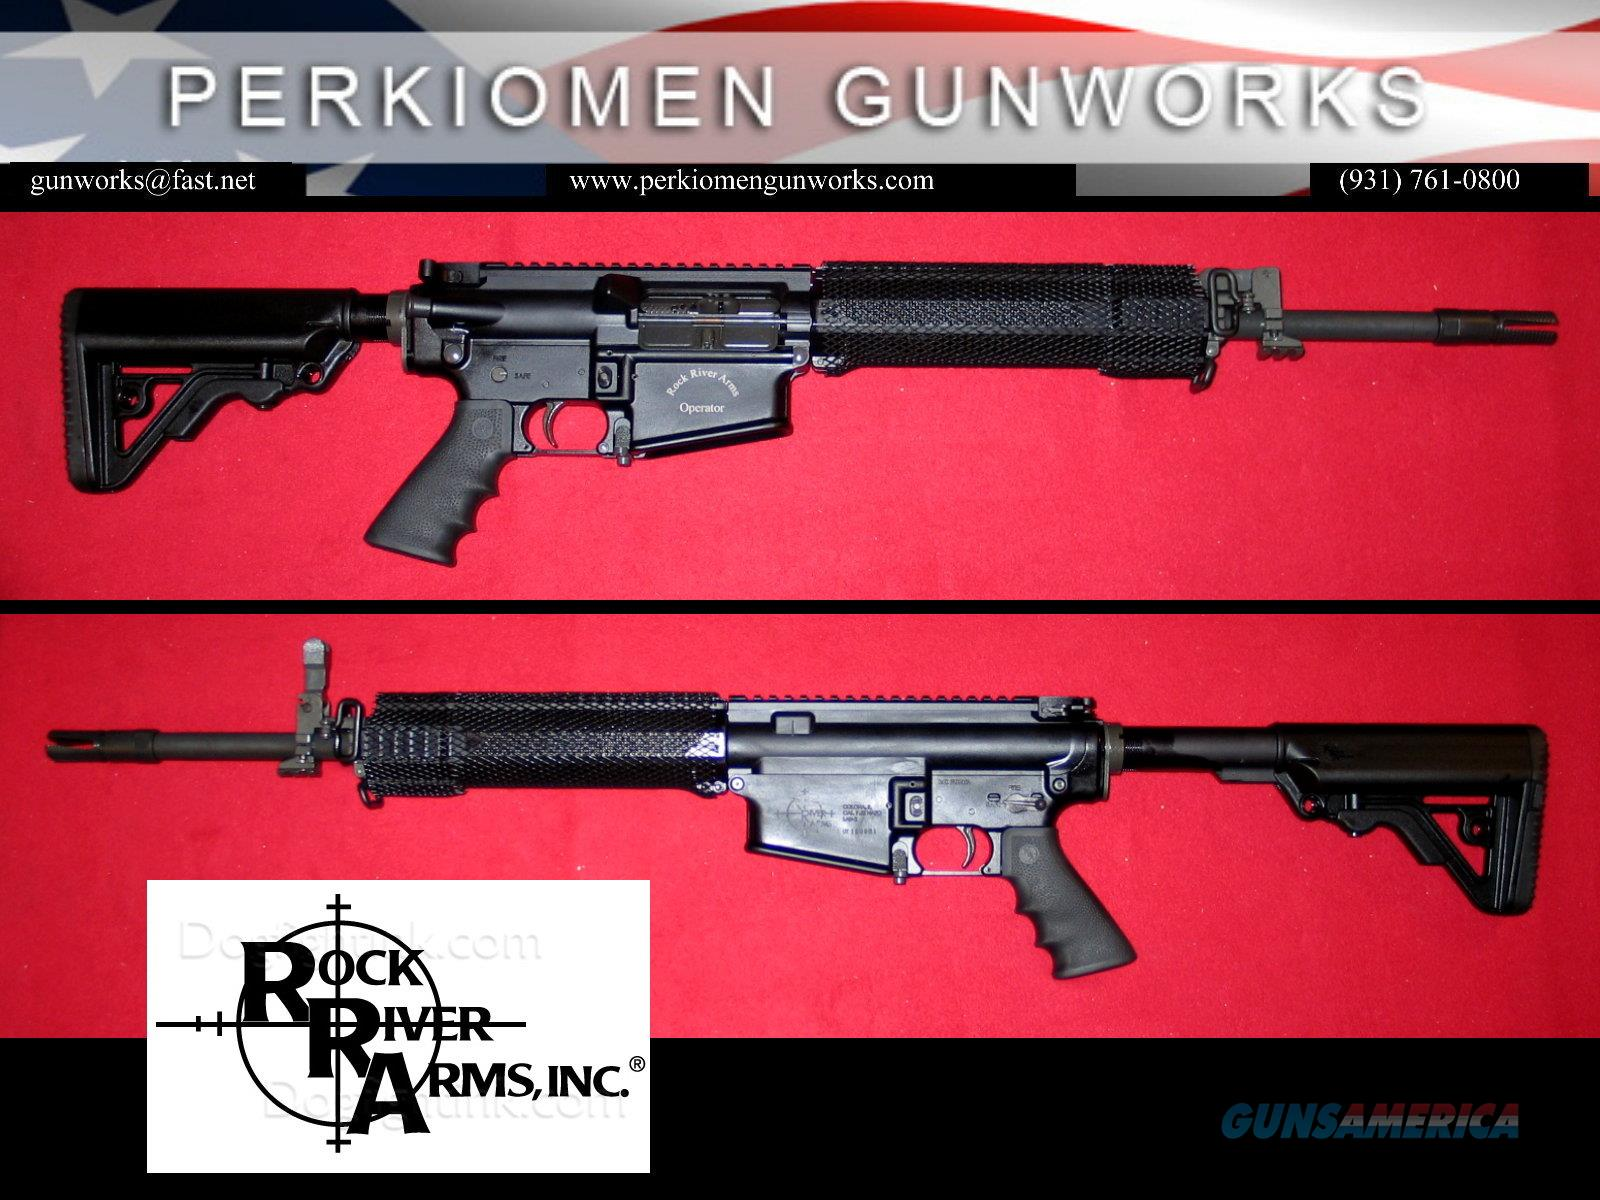 LAR-8 Elite Operator .308 w/Chrome Lined BBL - NIB  Guns > Rifles > Rock River Arms Rifles